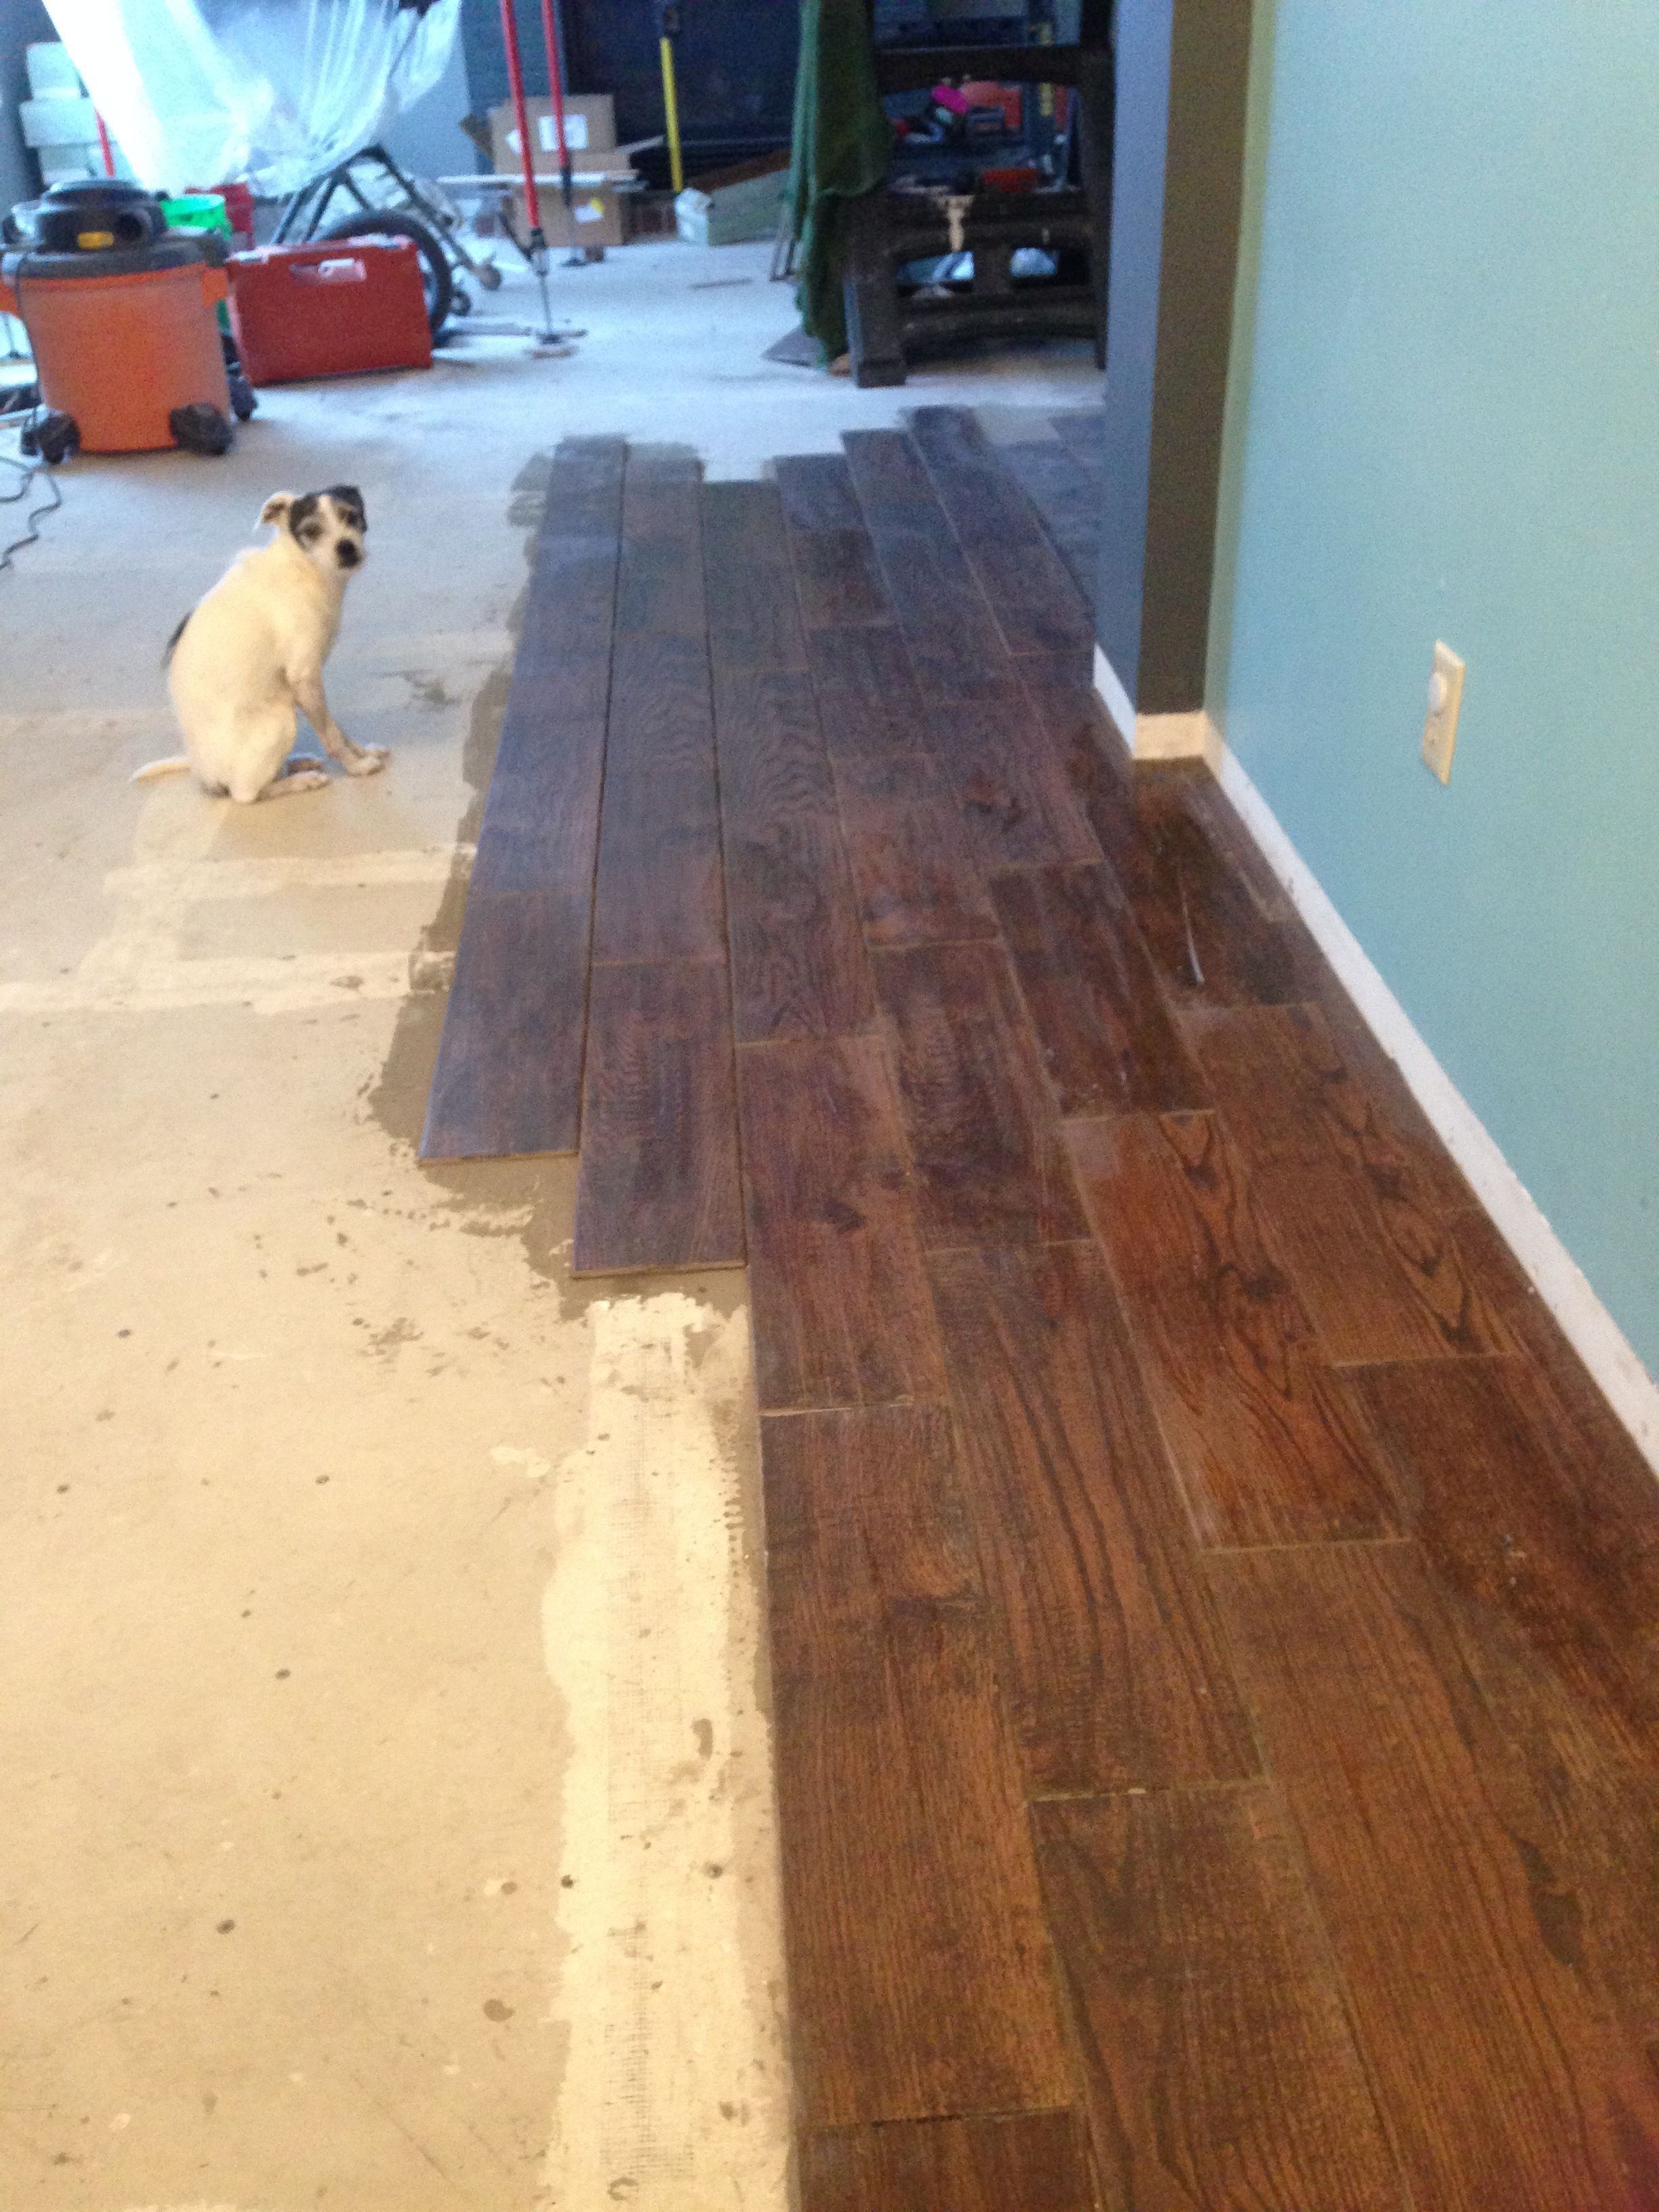 Ceramic Tile That Looks Like Hardwood Floor And Bruno